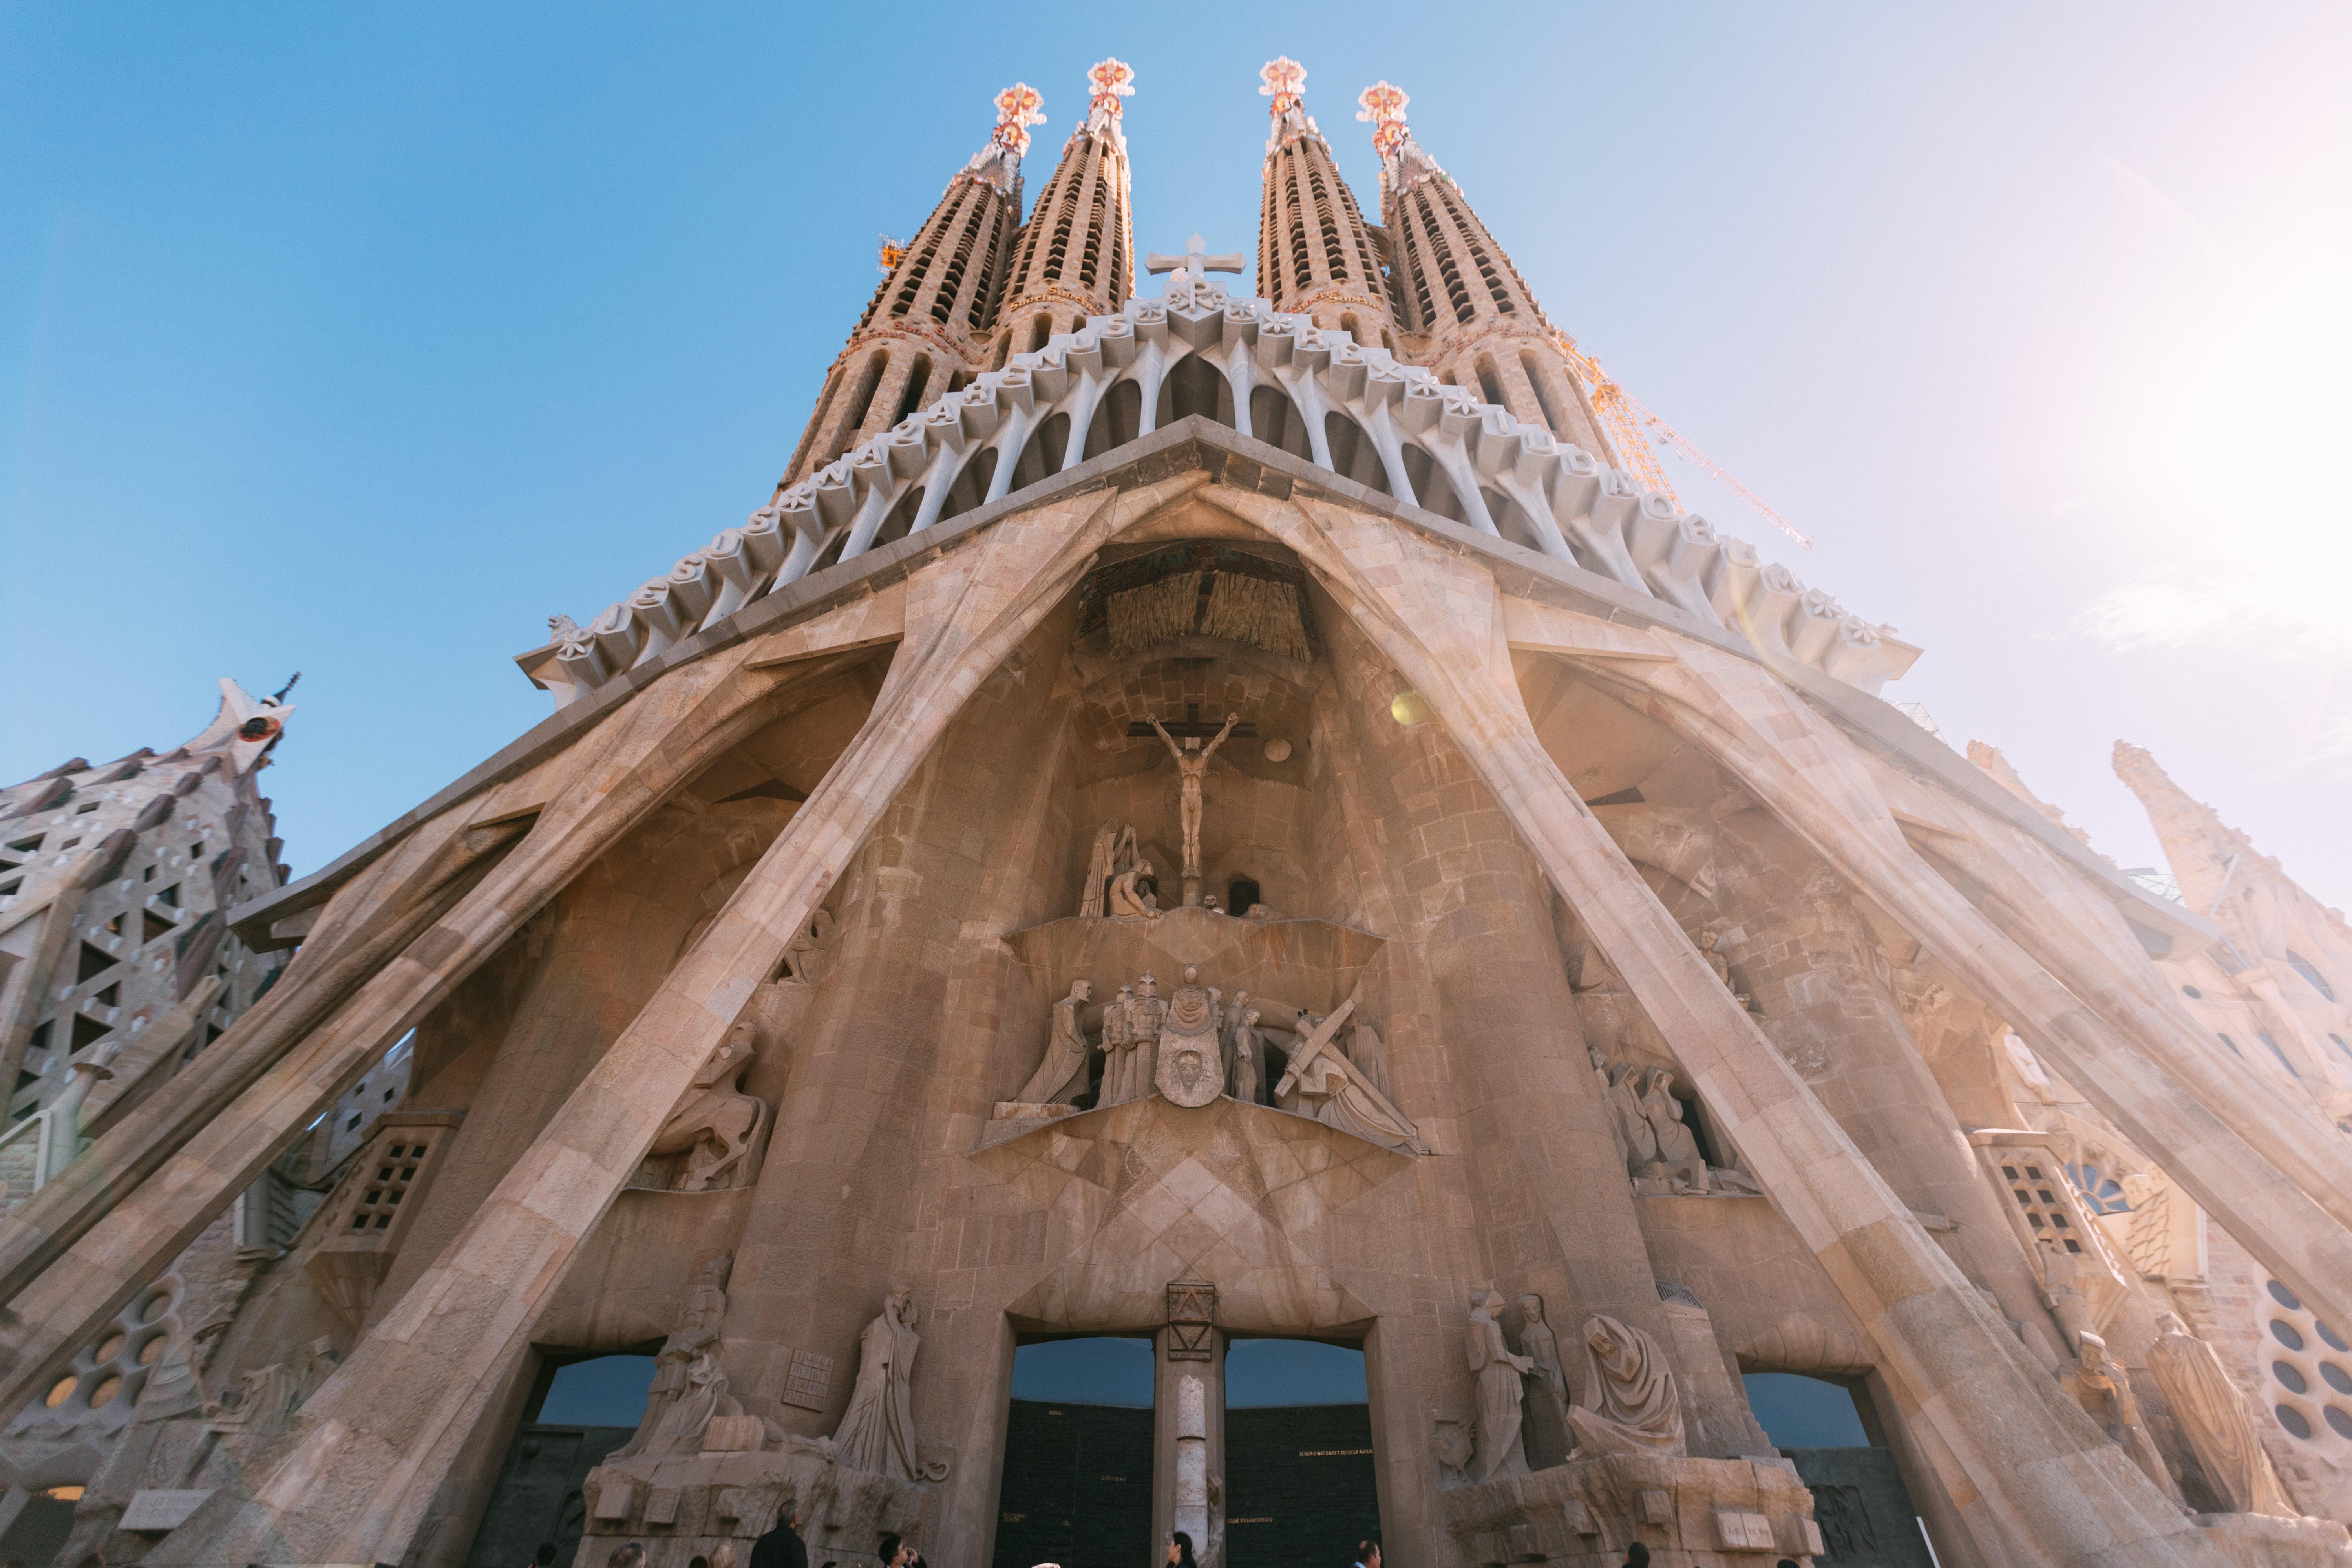 uSpots - La Sagrada Familia - Gaudí (2)